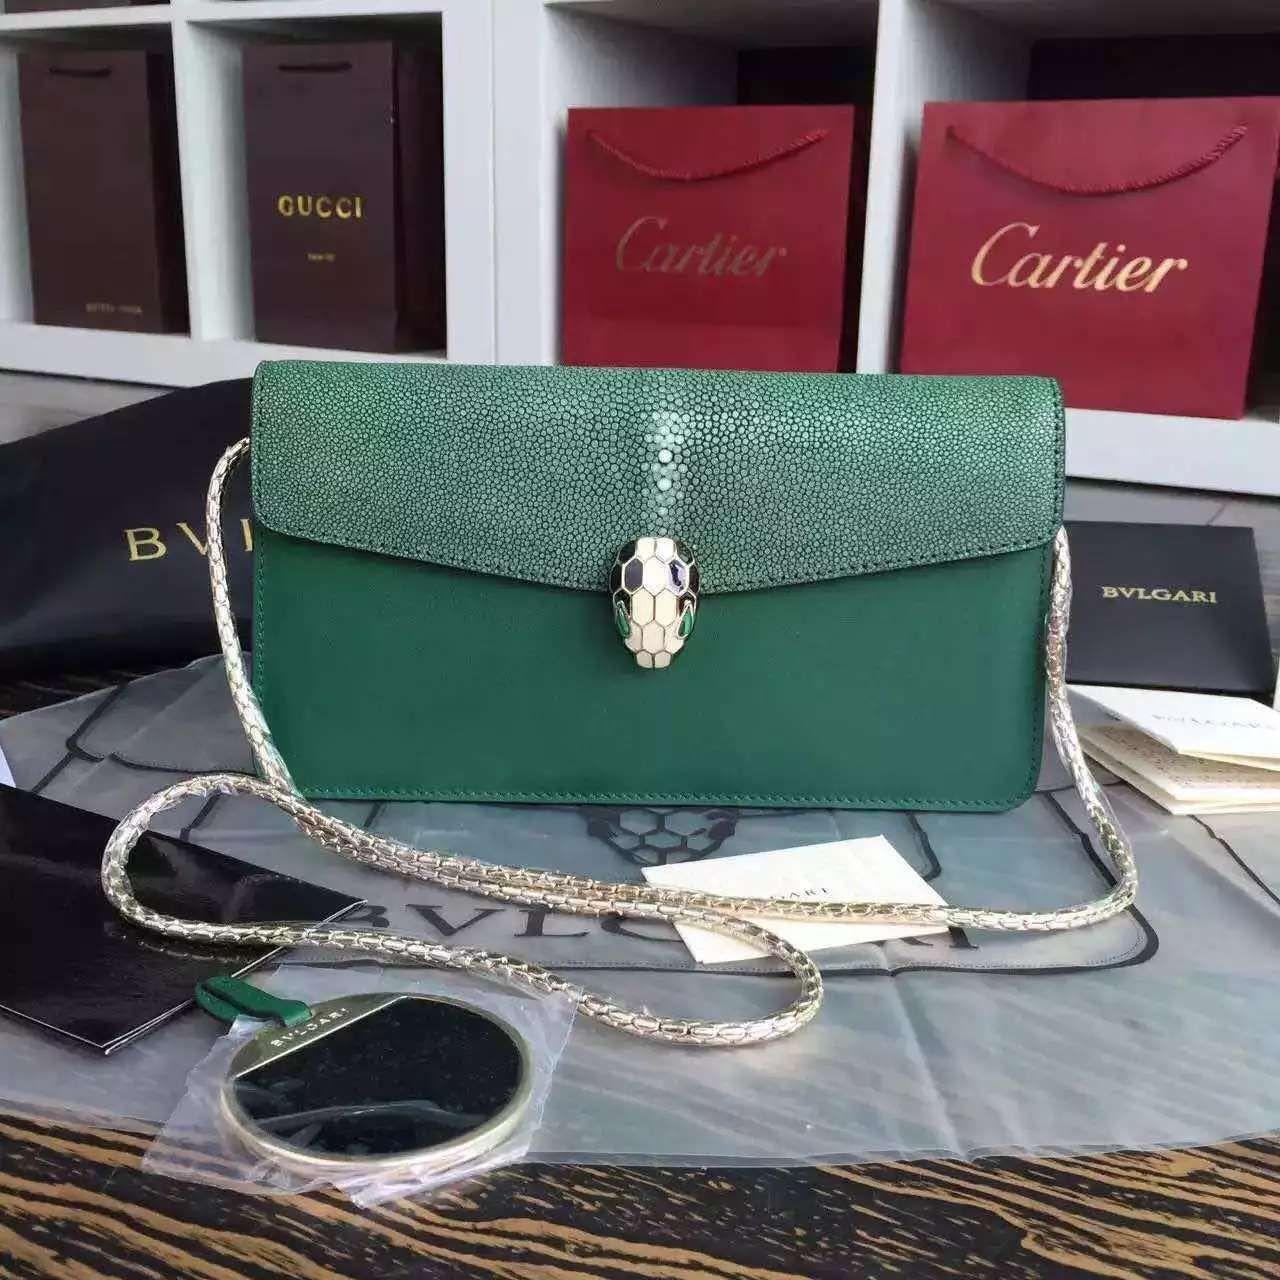 bvlgari Bag, ID : 37307(FORSALE:a@yybags.com), bulgari backpack sale, bvlgari handbags, bulgari stylish handbags, bulgari branded handbags for womens, bulgari best leather briefcase, bulgari women's handbags on sale, bulgari money wallet, bulgari ladies handbags on sale, bulgari clutch purse, bulgari leather briefcase for men #bvlgariBag #bvlgari #bulgari #backpacking #packs